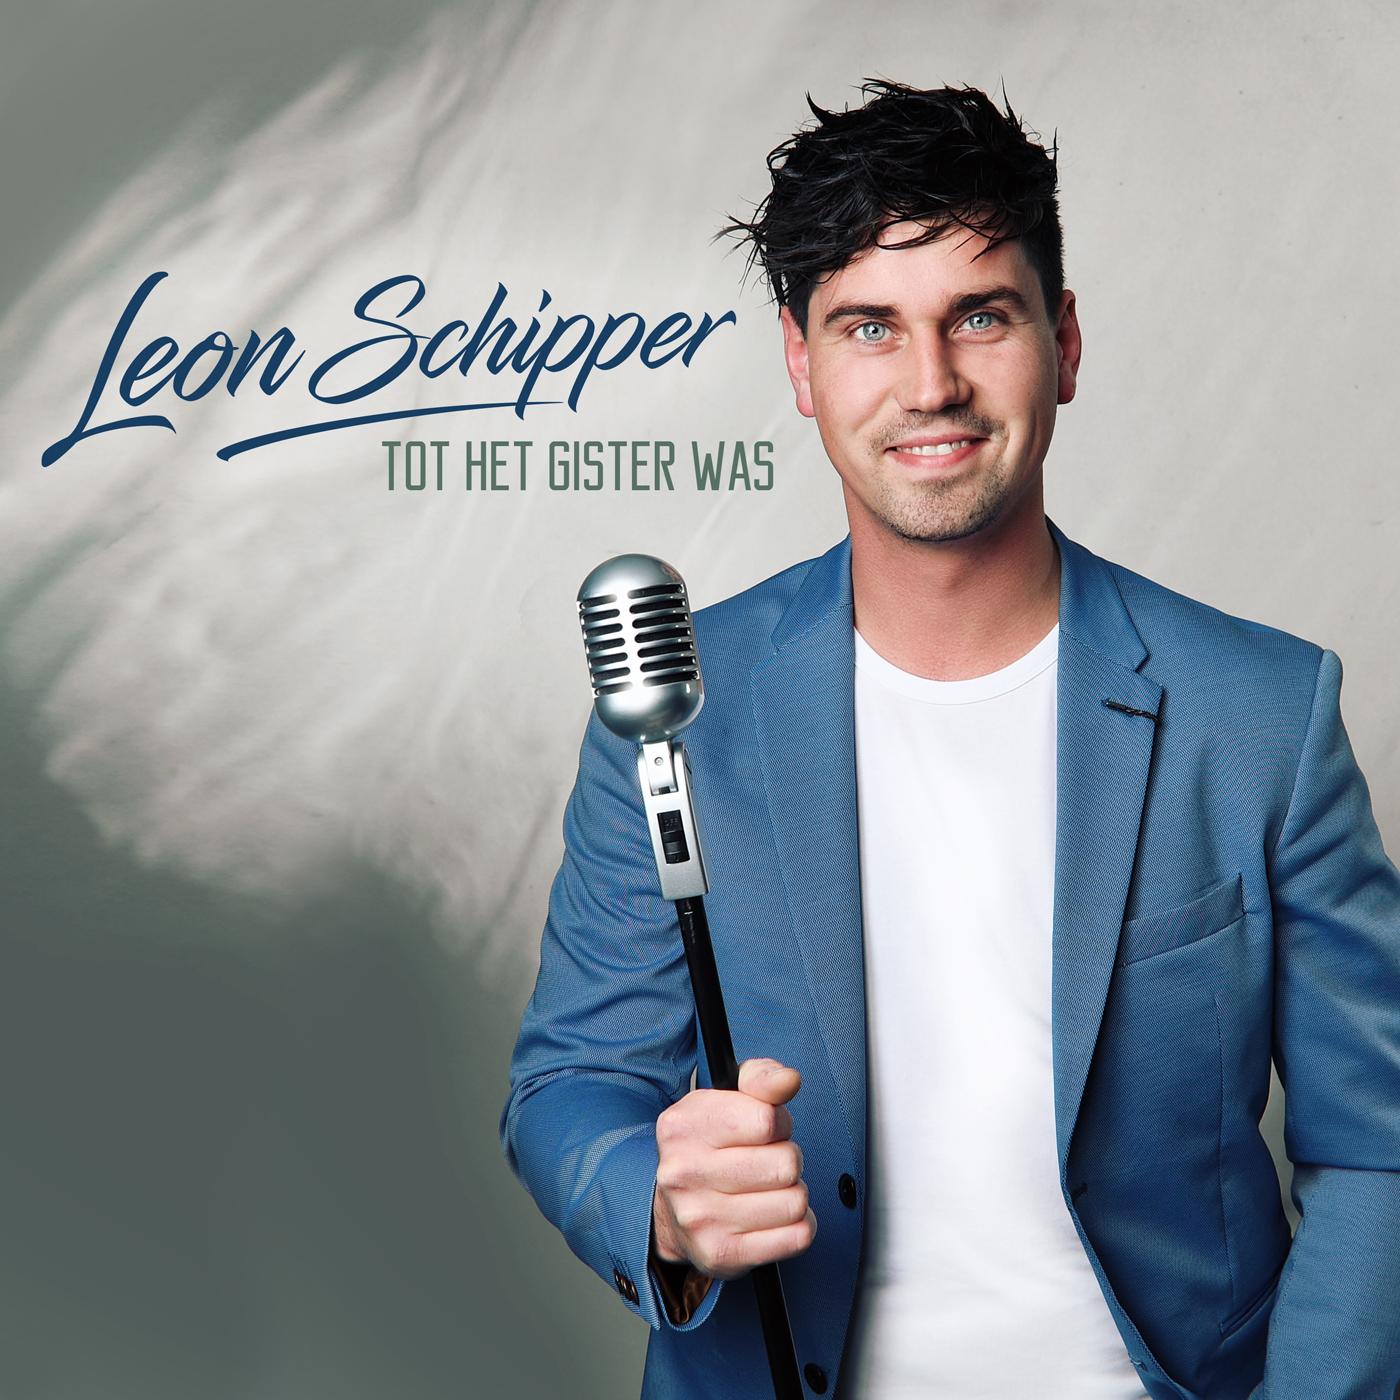 Leon Schipper